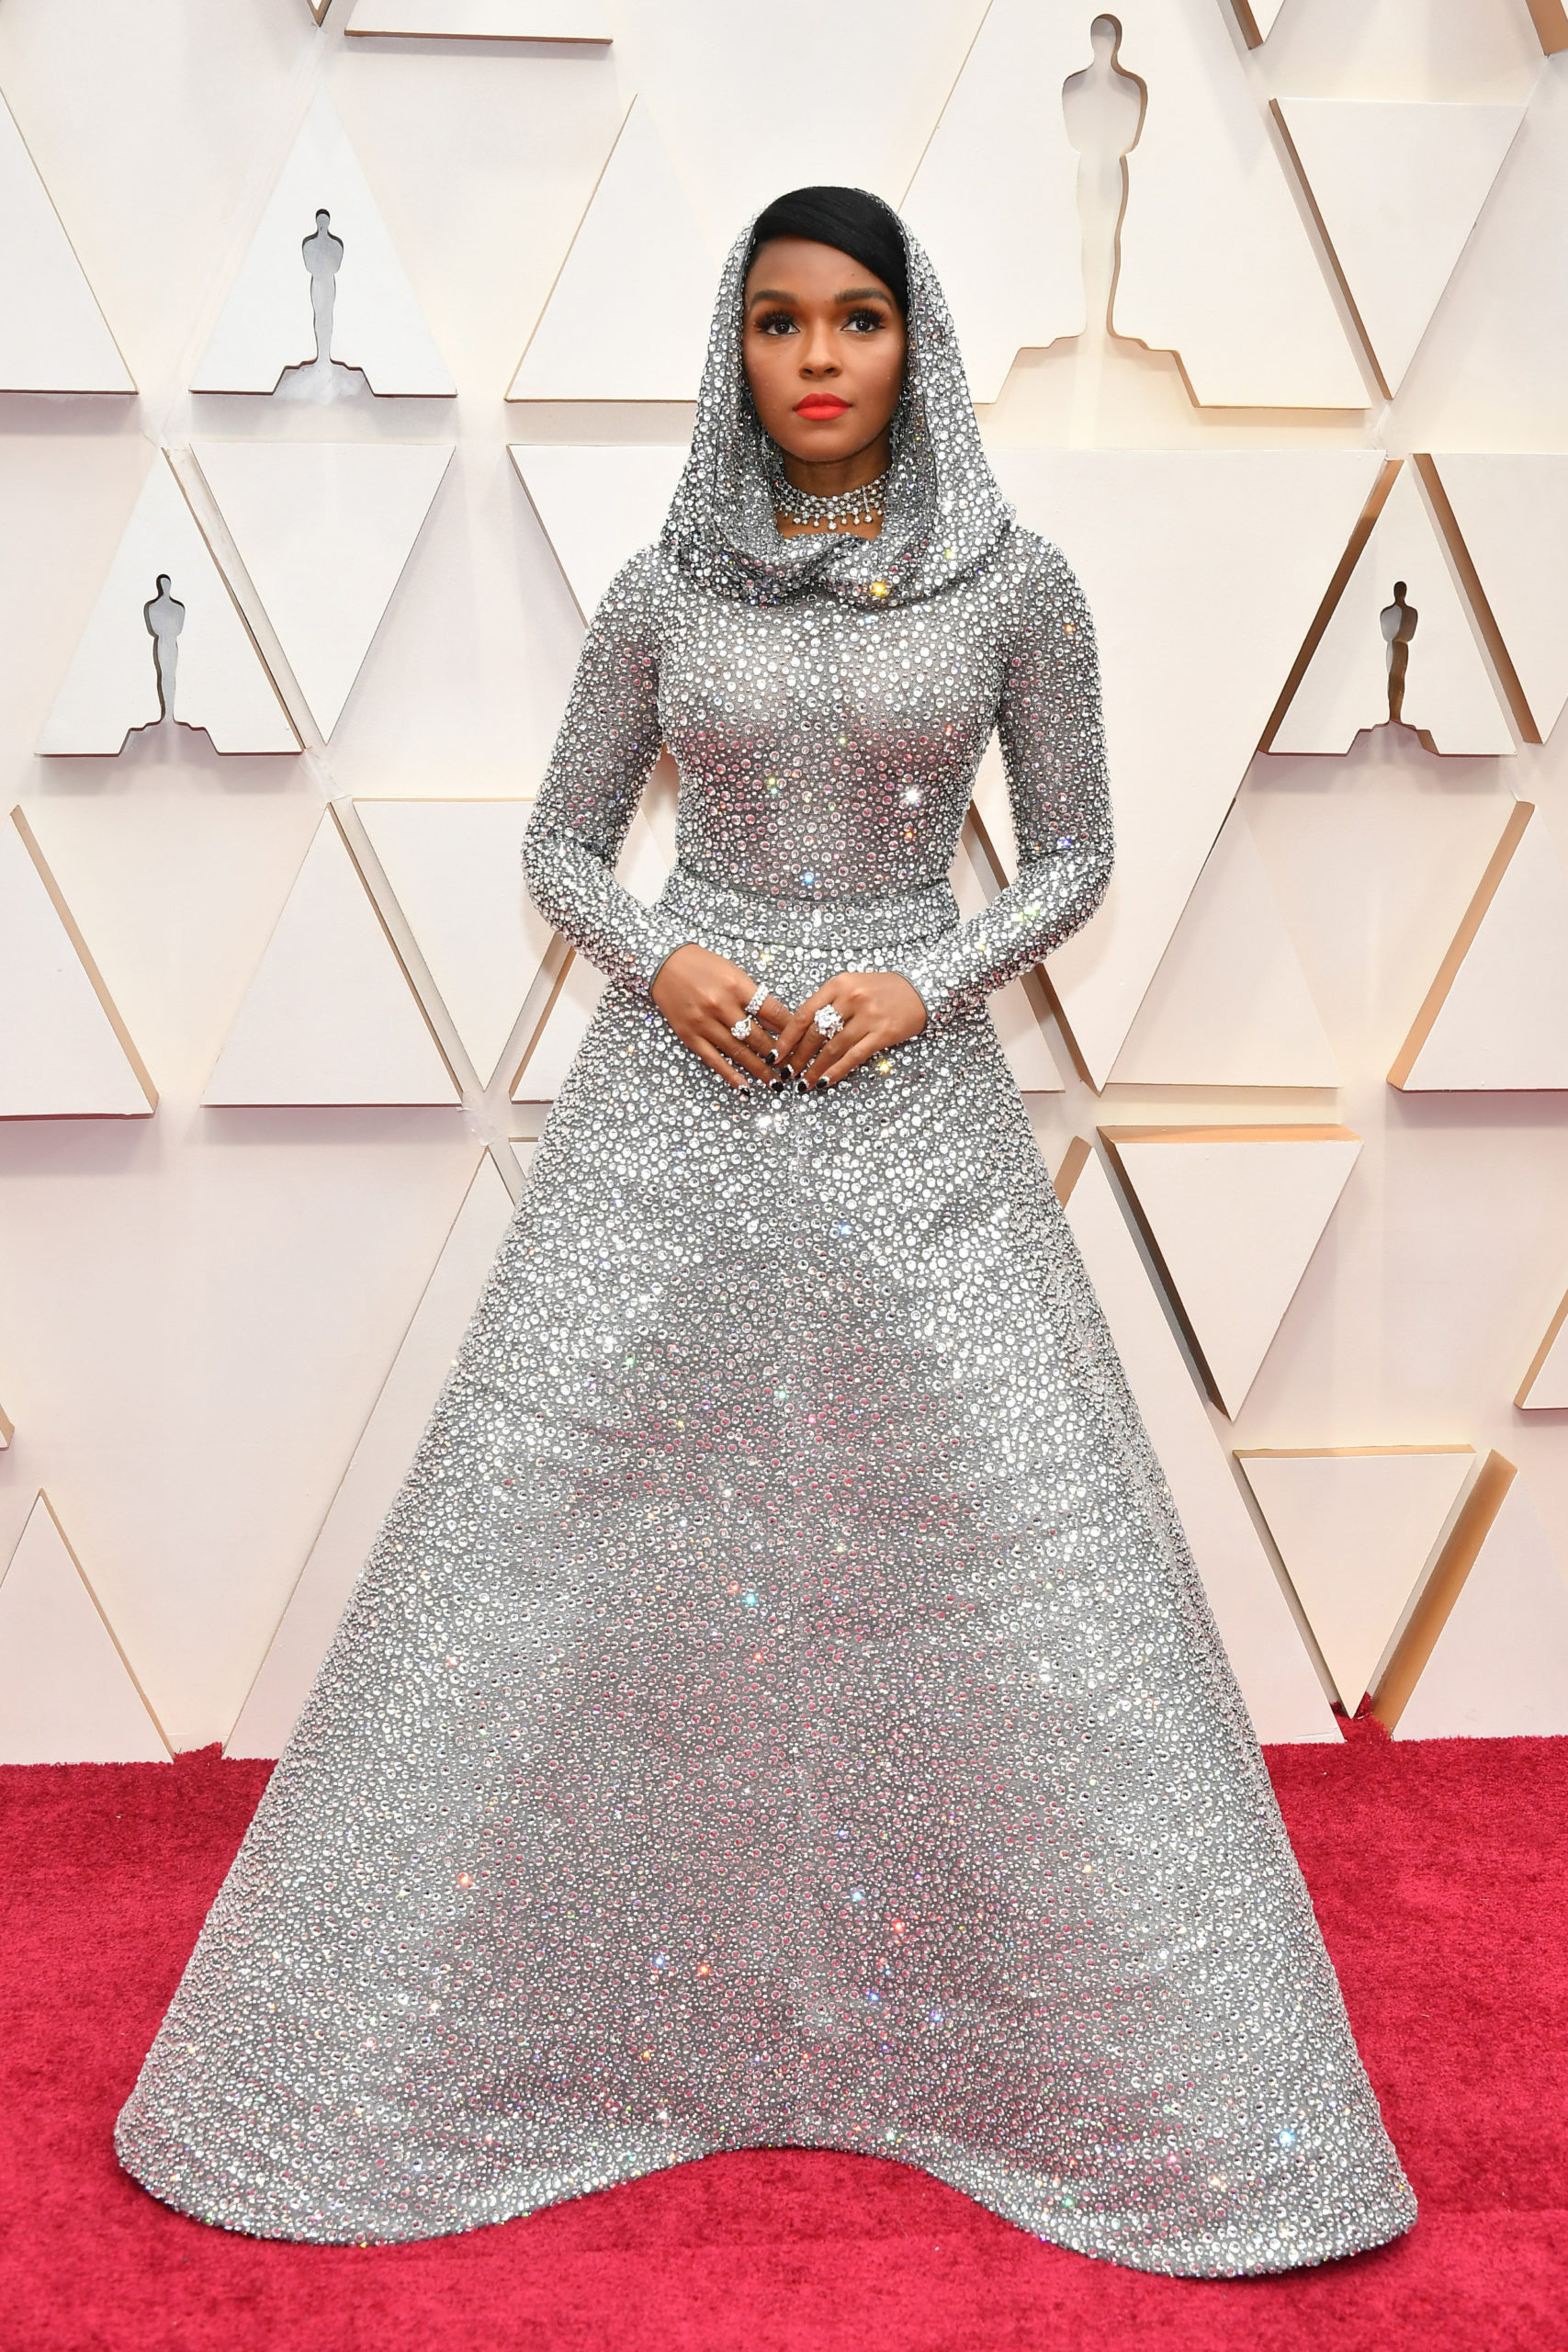 Oscars 2020 - Janelle Monae